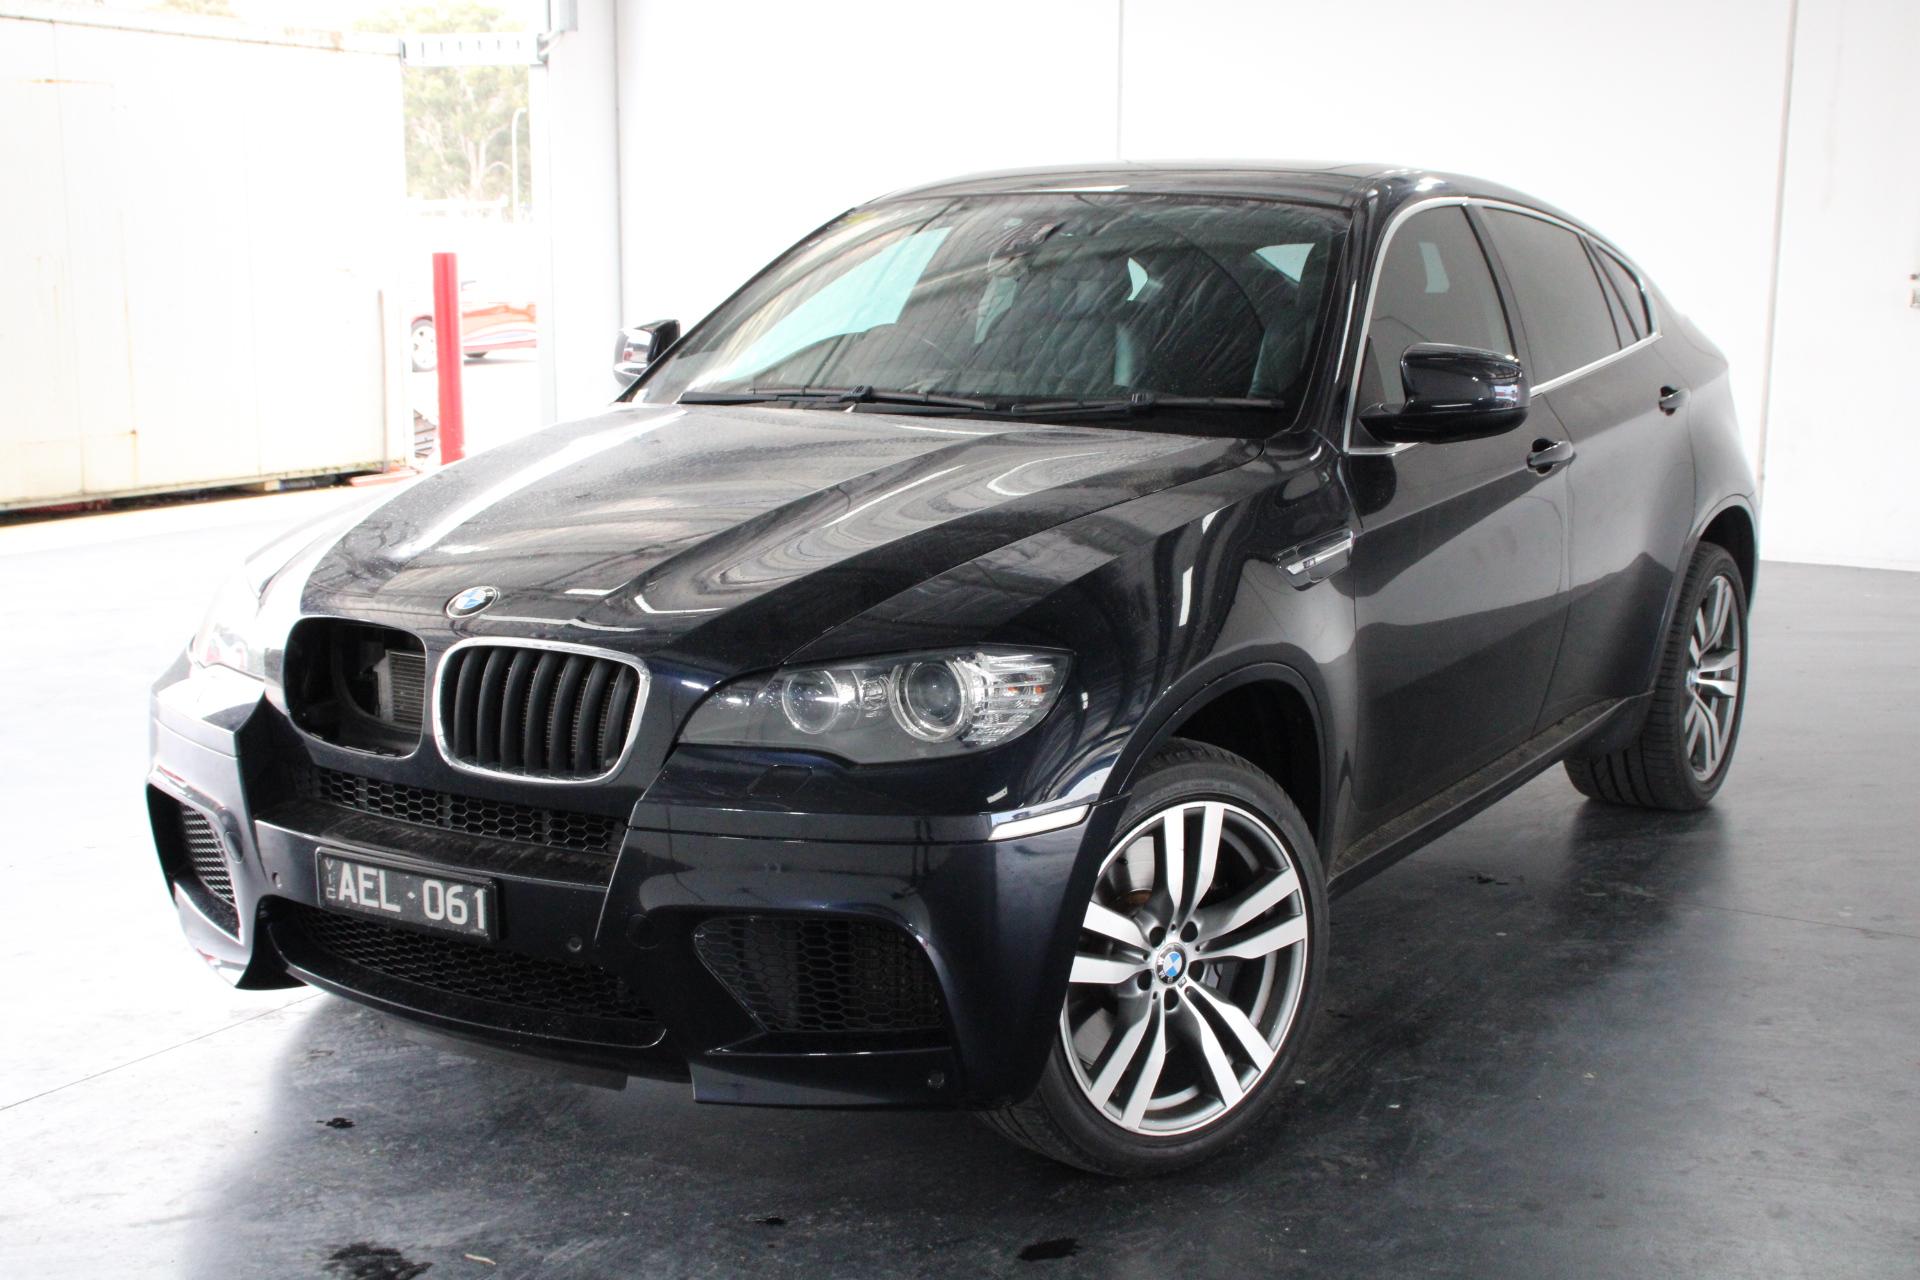 2010 BMW X6 M E71 6sp auto 4.4L V8 T/Petrol Coupe, 138,252km Indicated